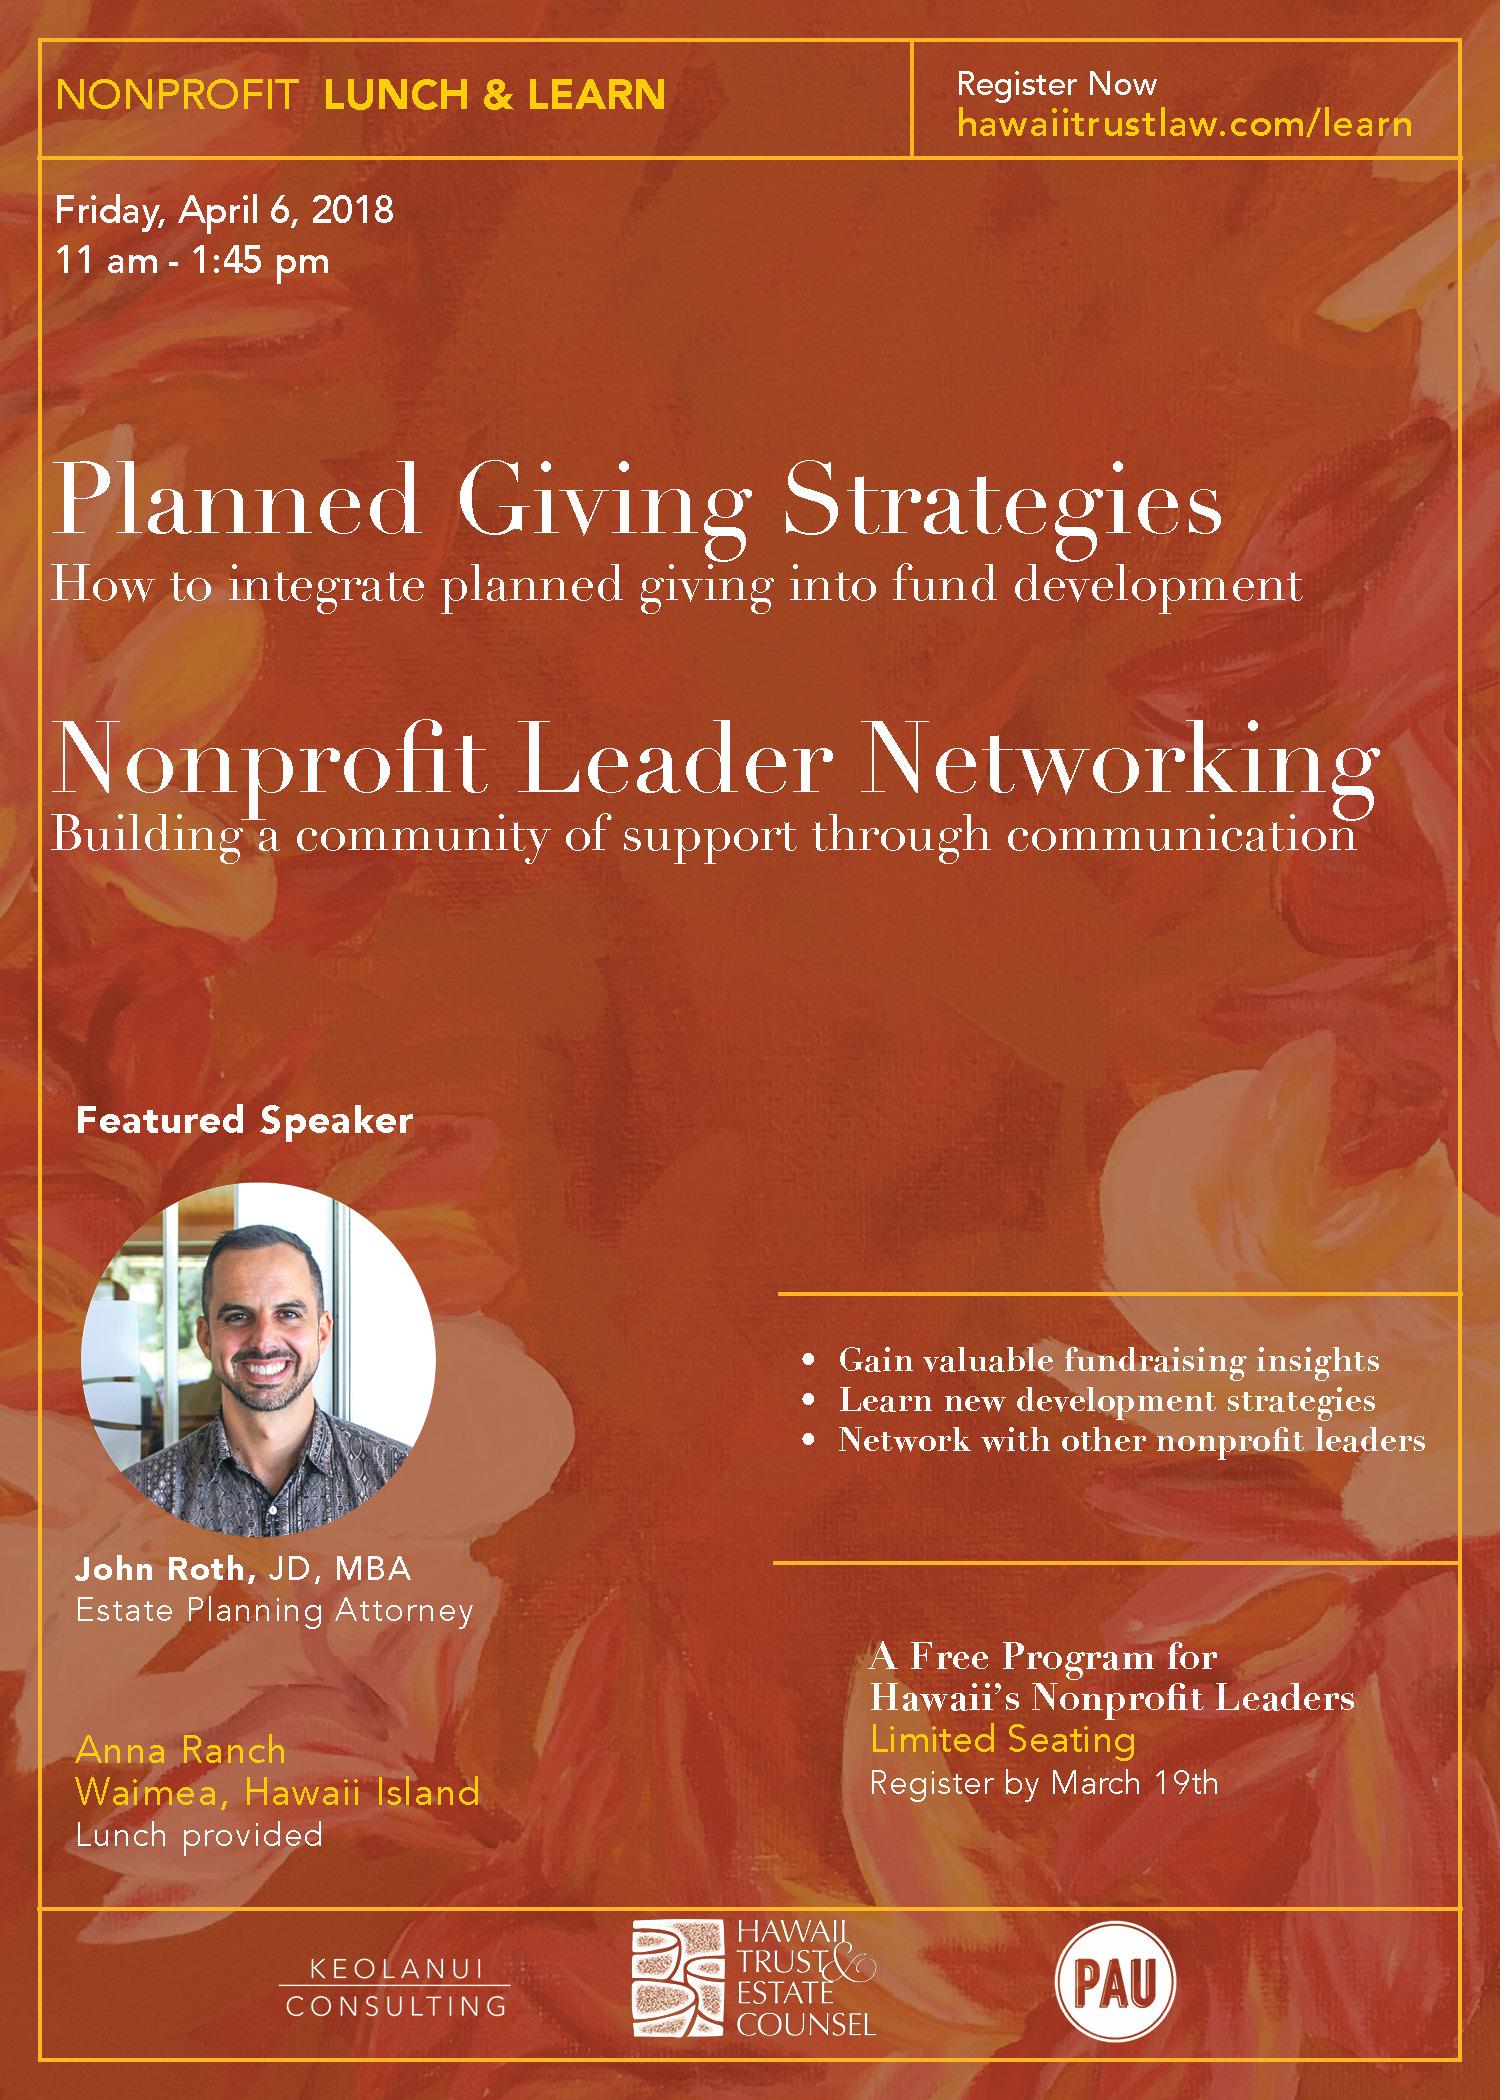 Print_Nonprofit Lunch & Learn_5x7_Invitation_4.7.17_FINAL.jpg